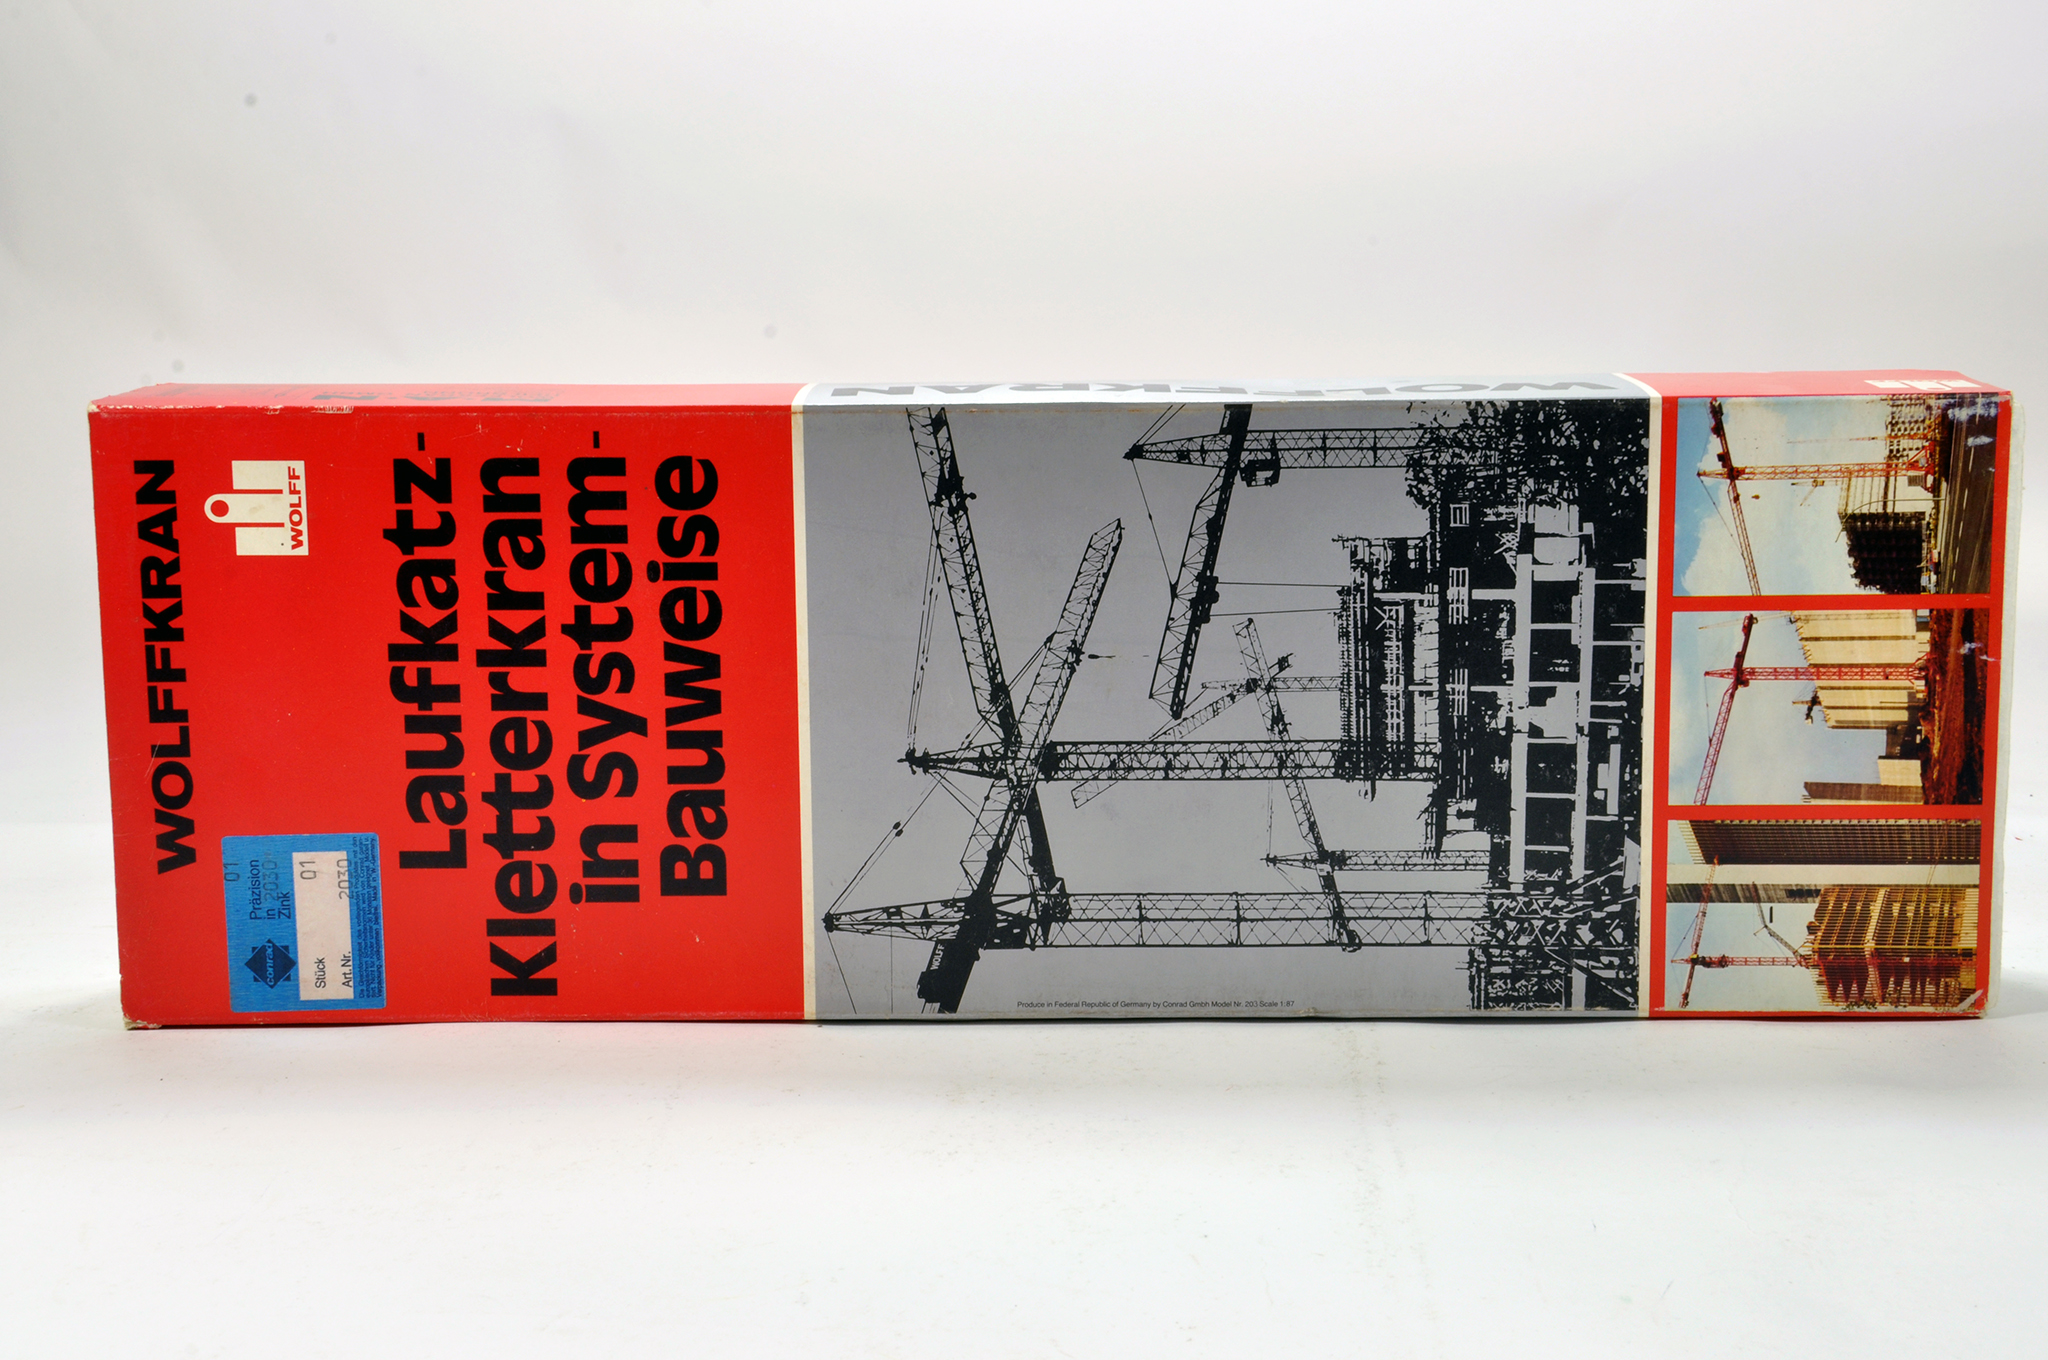 Lot 303 - Conrad 1/87 Construction issue comprising No. 2030 Wolffkran Tower Crane. Generally E to NM.